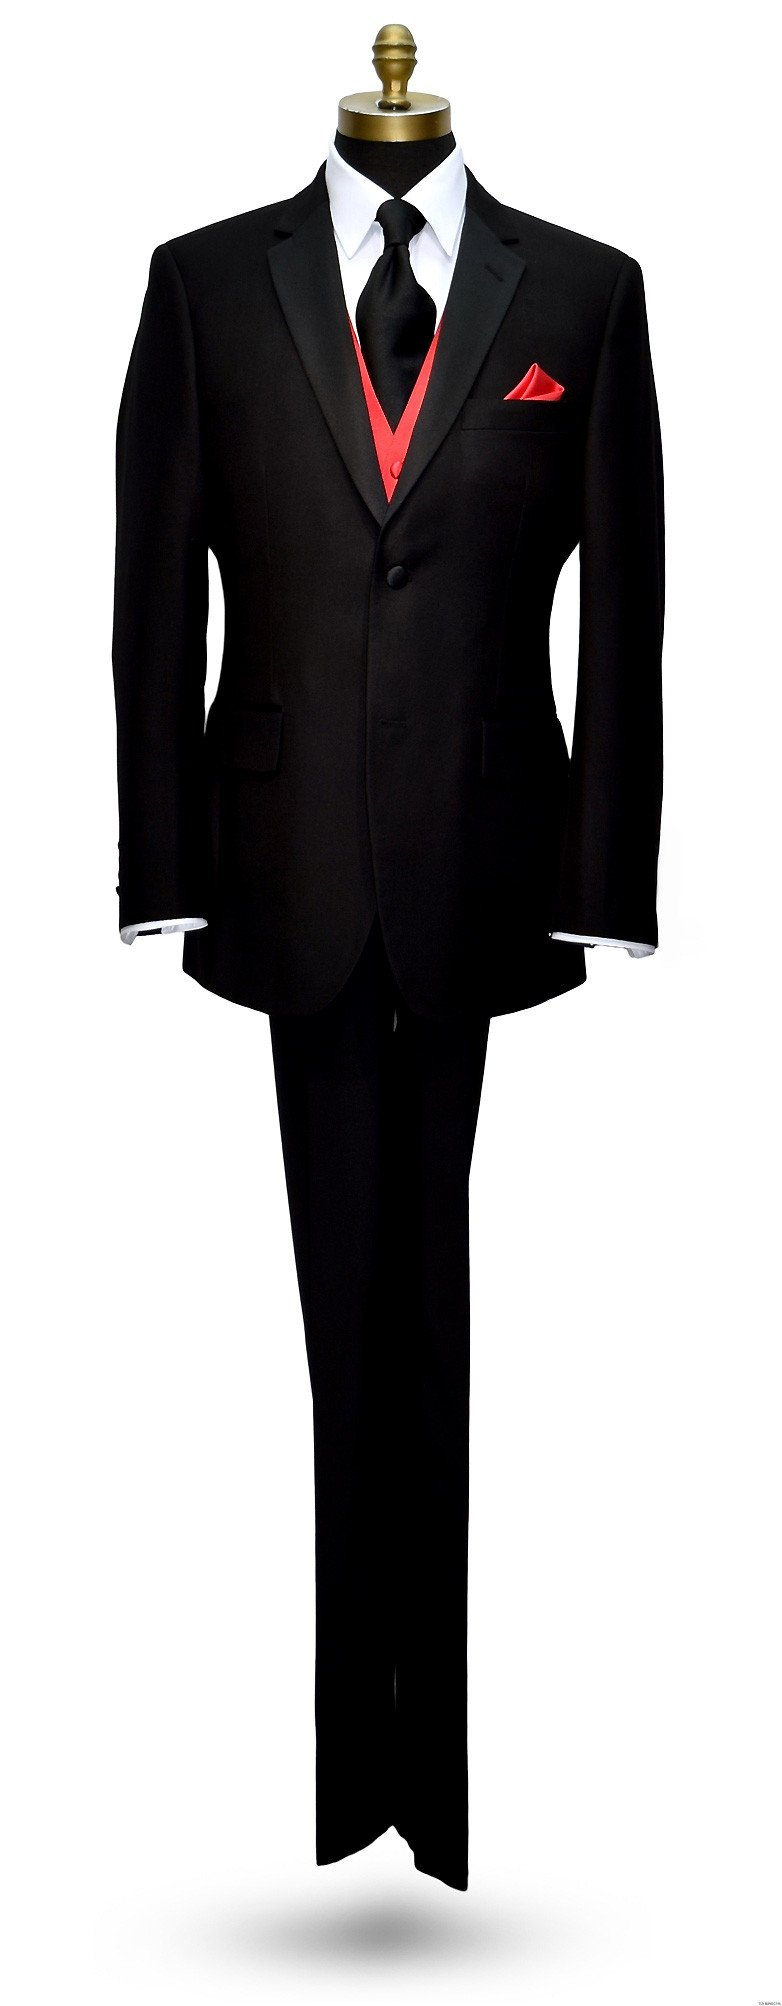 men's red tuxedo vest with long black dress tie on tuxbling.com